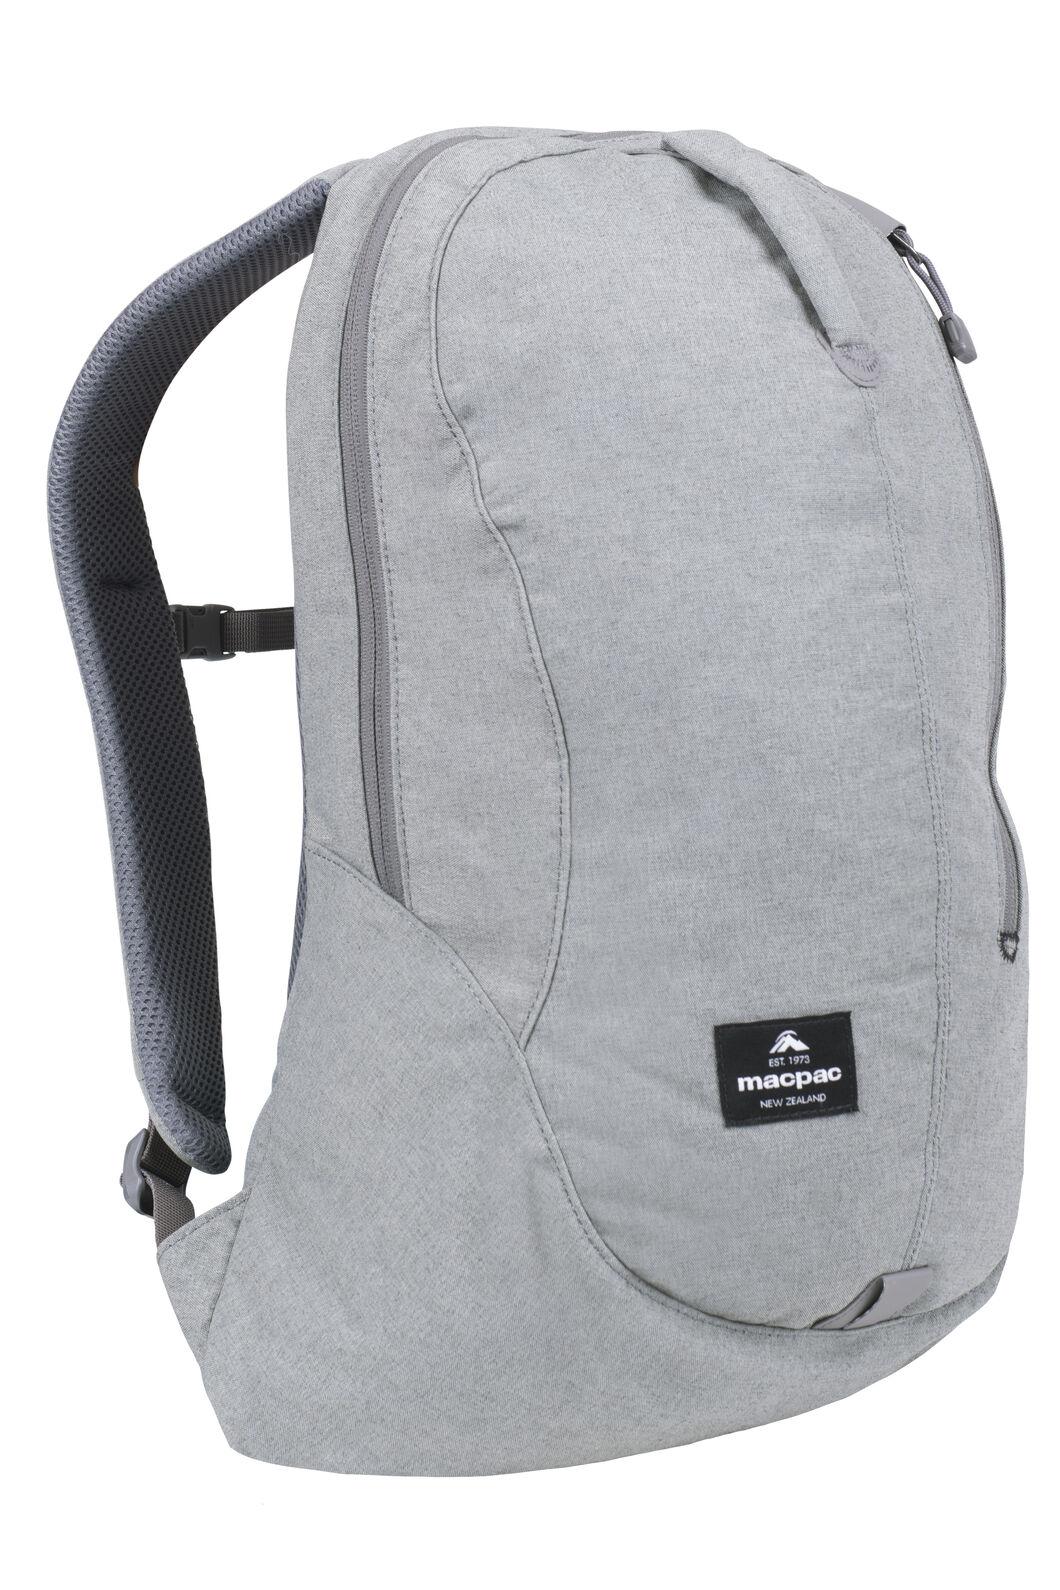 Macpac Kahuna 18L Urban Backpack, Castor Grey, hi-res